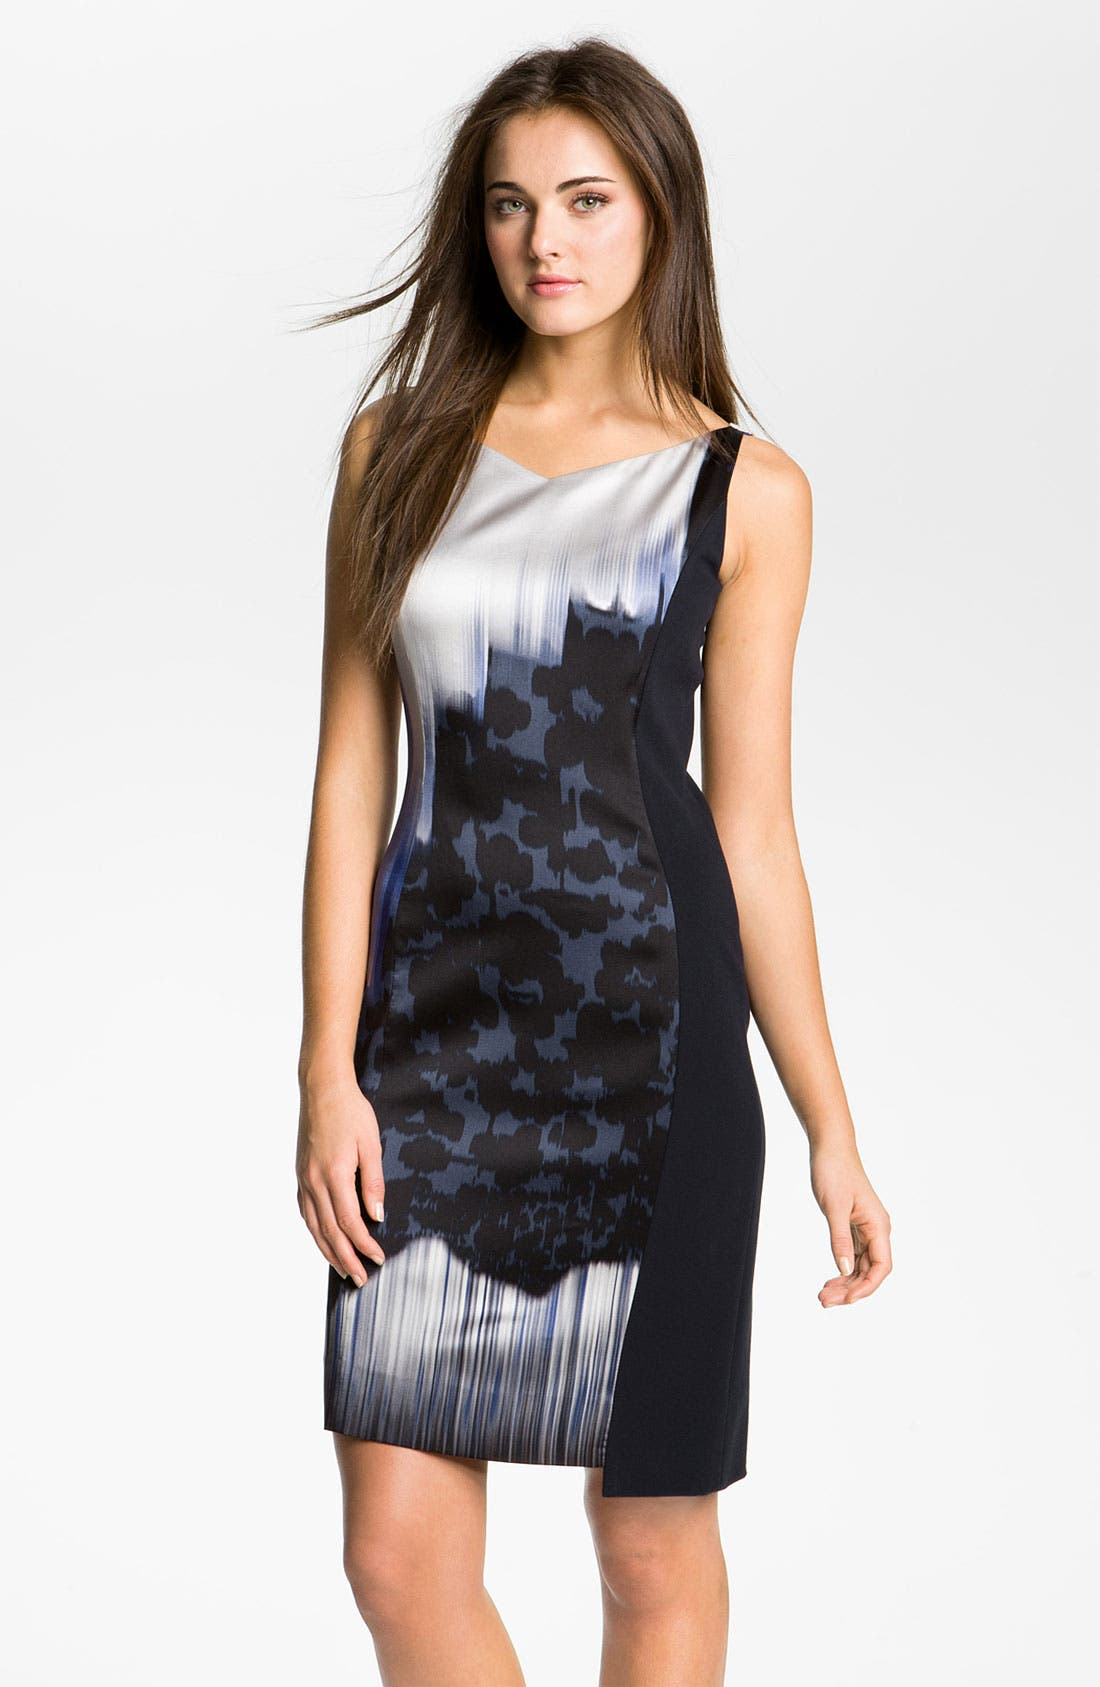 Alternate Image 1 Selected - Elie Tahari 'Margie' Print Charmeuse Sheath Dress